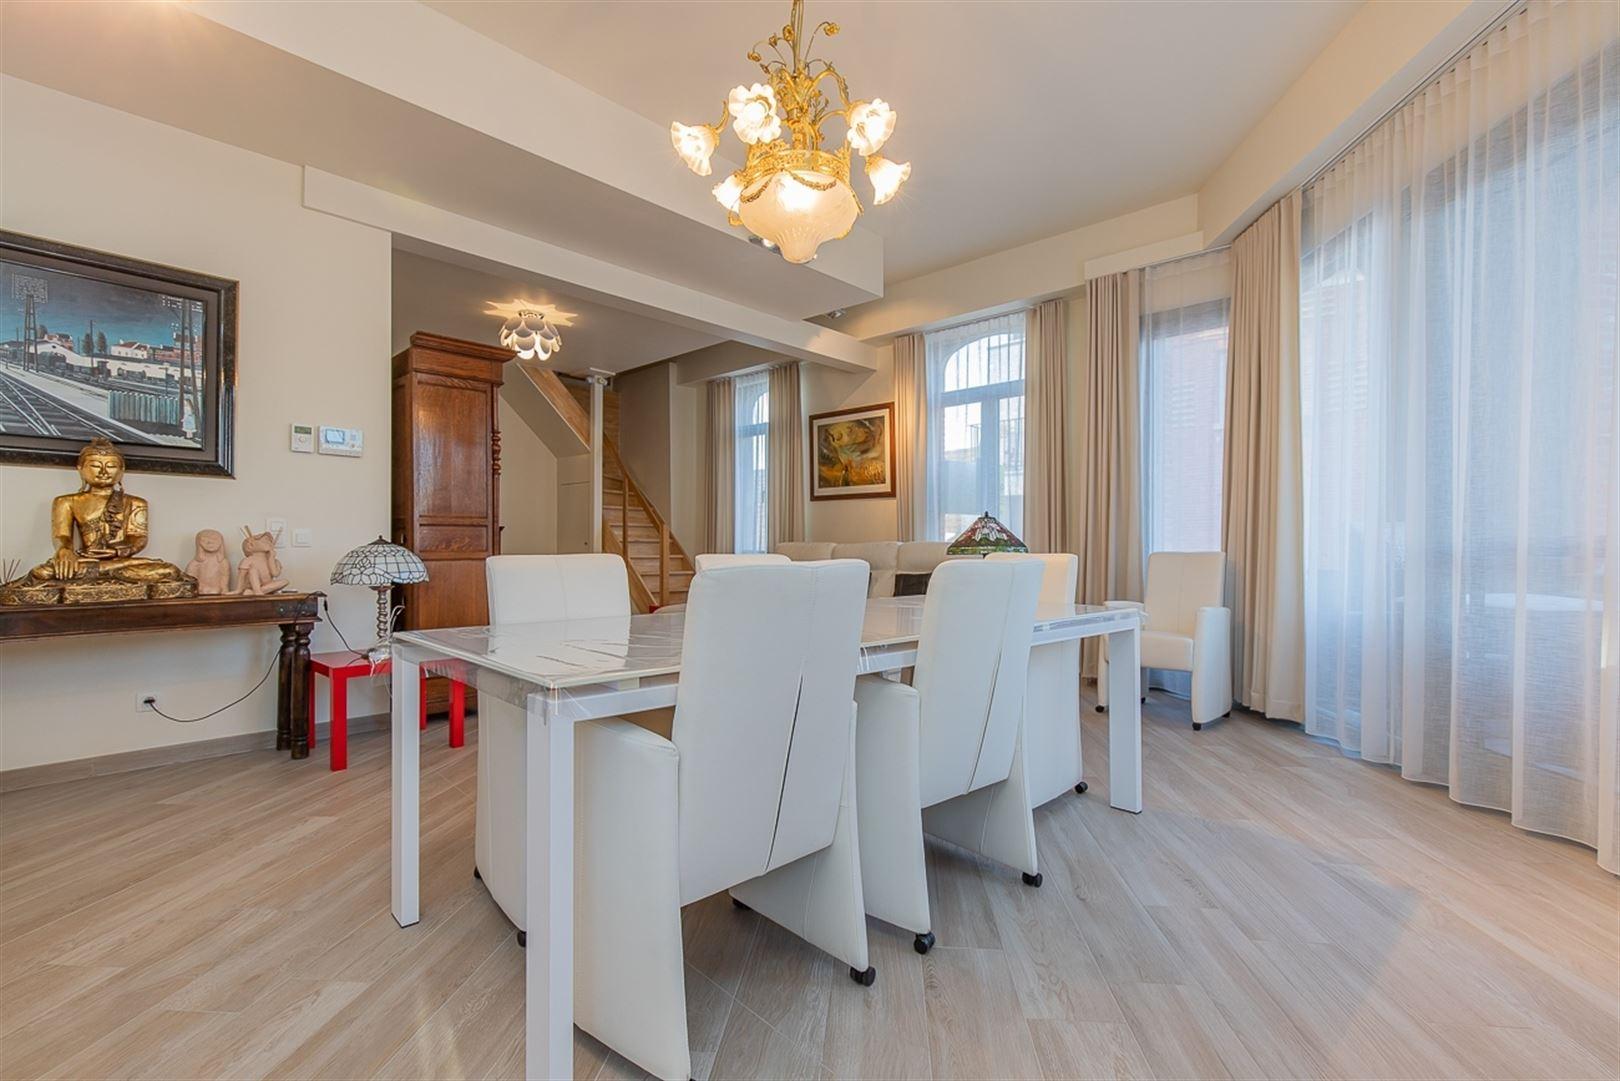 Foto 5 : Duplex/Penthouse te 9200 DENDERMONDE (België) - Prijs € 399.000